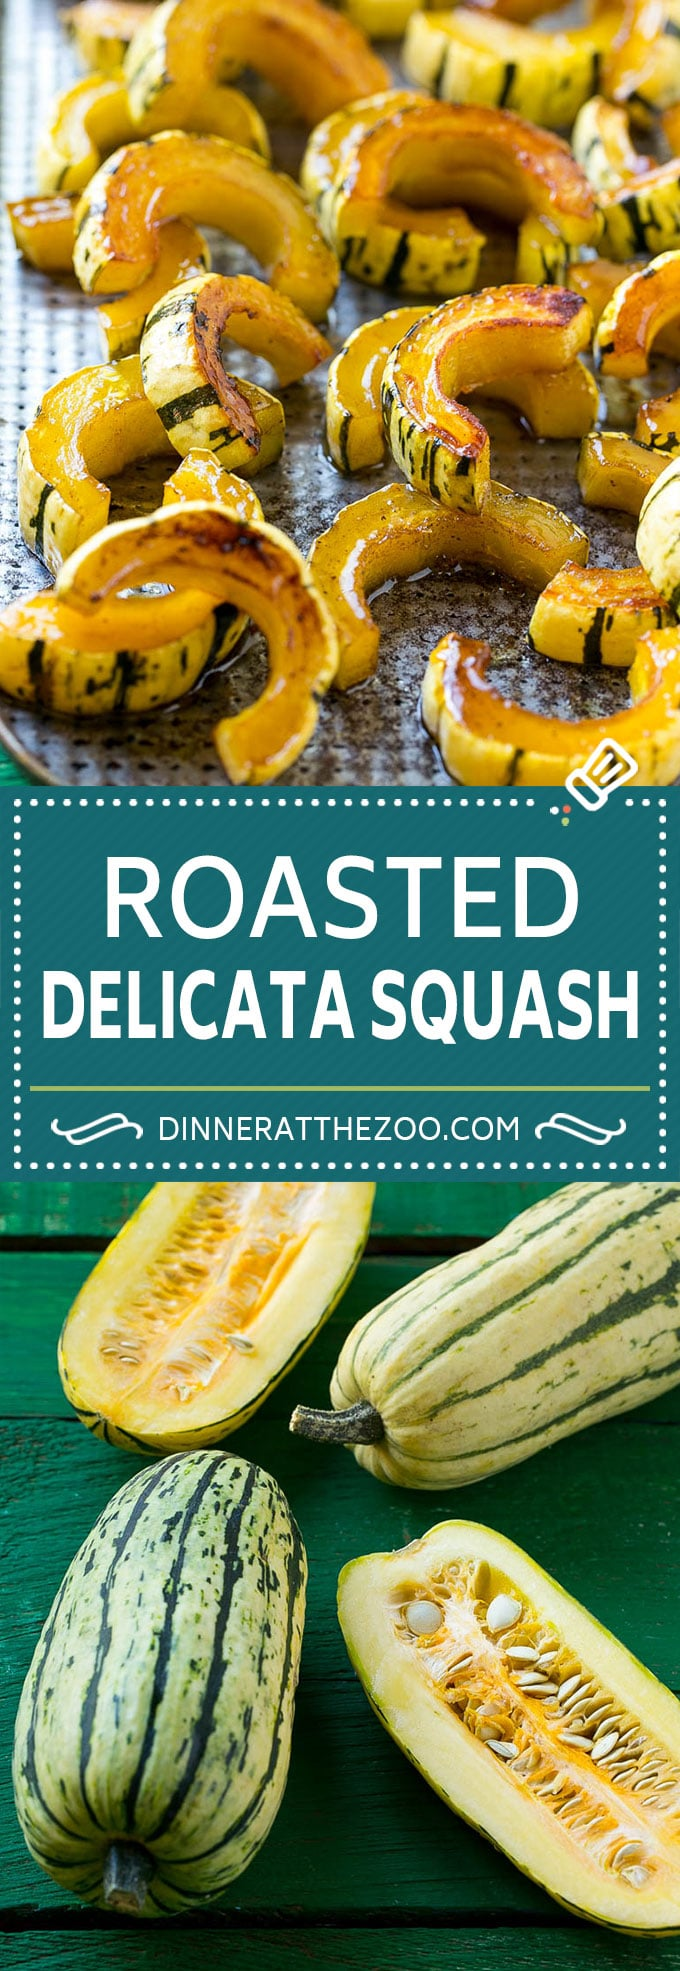 Brown Sugar Delicata Squash Recipe   Roasted Squash   Delicata Squash   Winter Squash Recipe #squash #wintersquash #brownsugar #sidedish #delicatasquash #dinner #dinneratthezoo